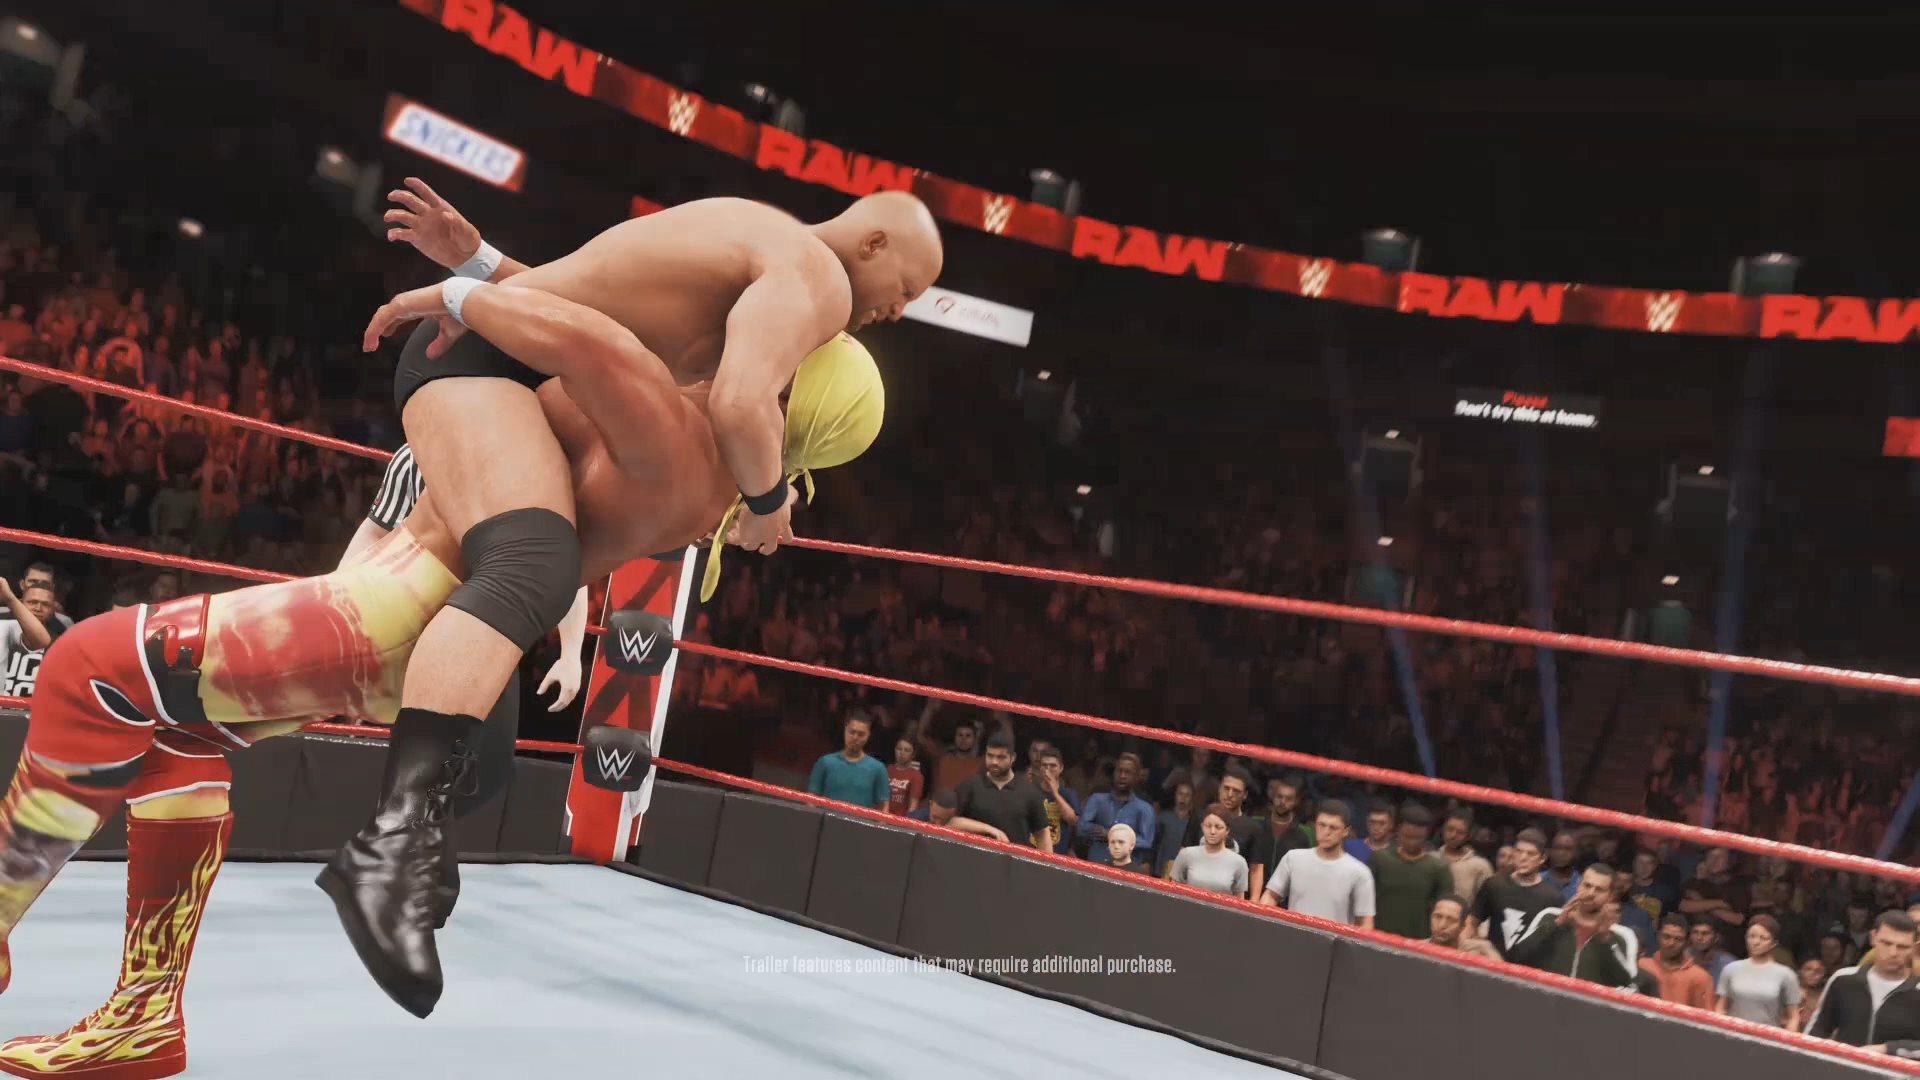 《WWE 2K20》今日全球正式发售 真人预告片公开